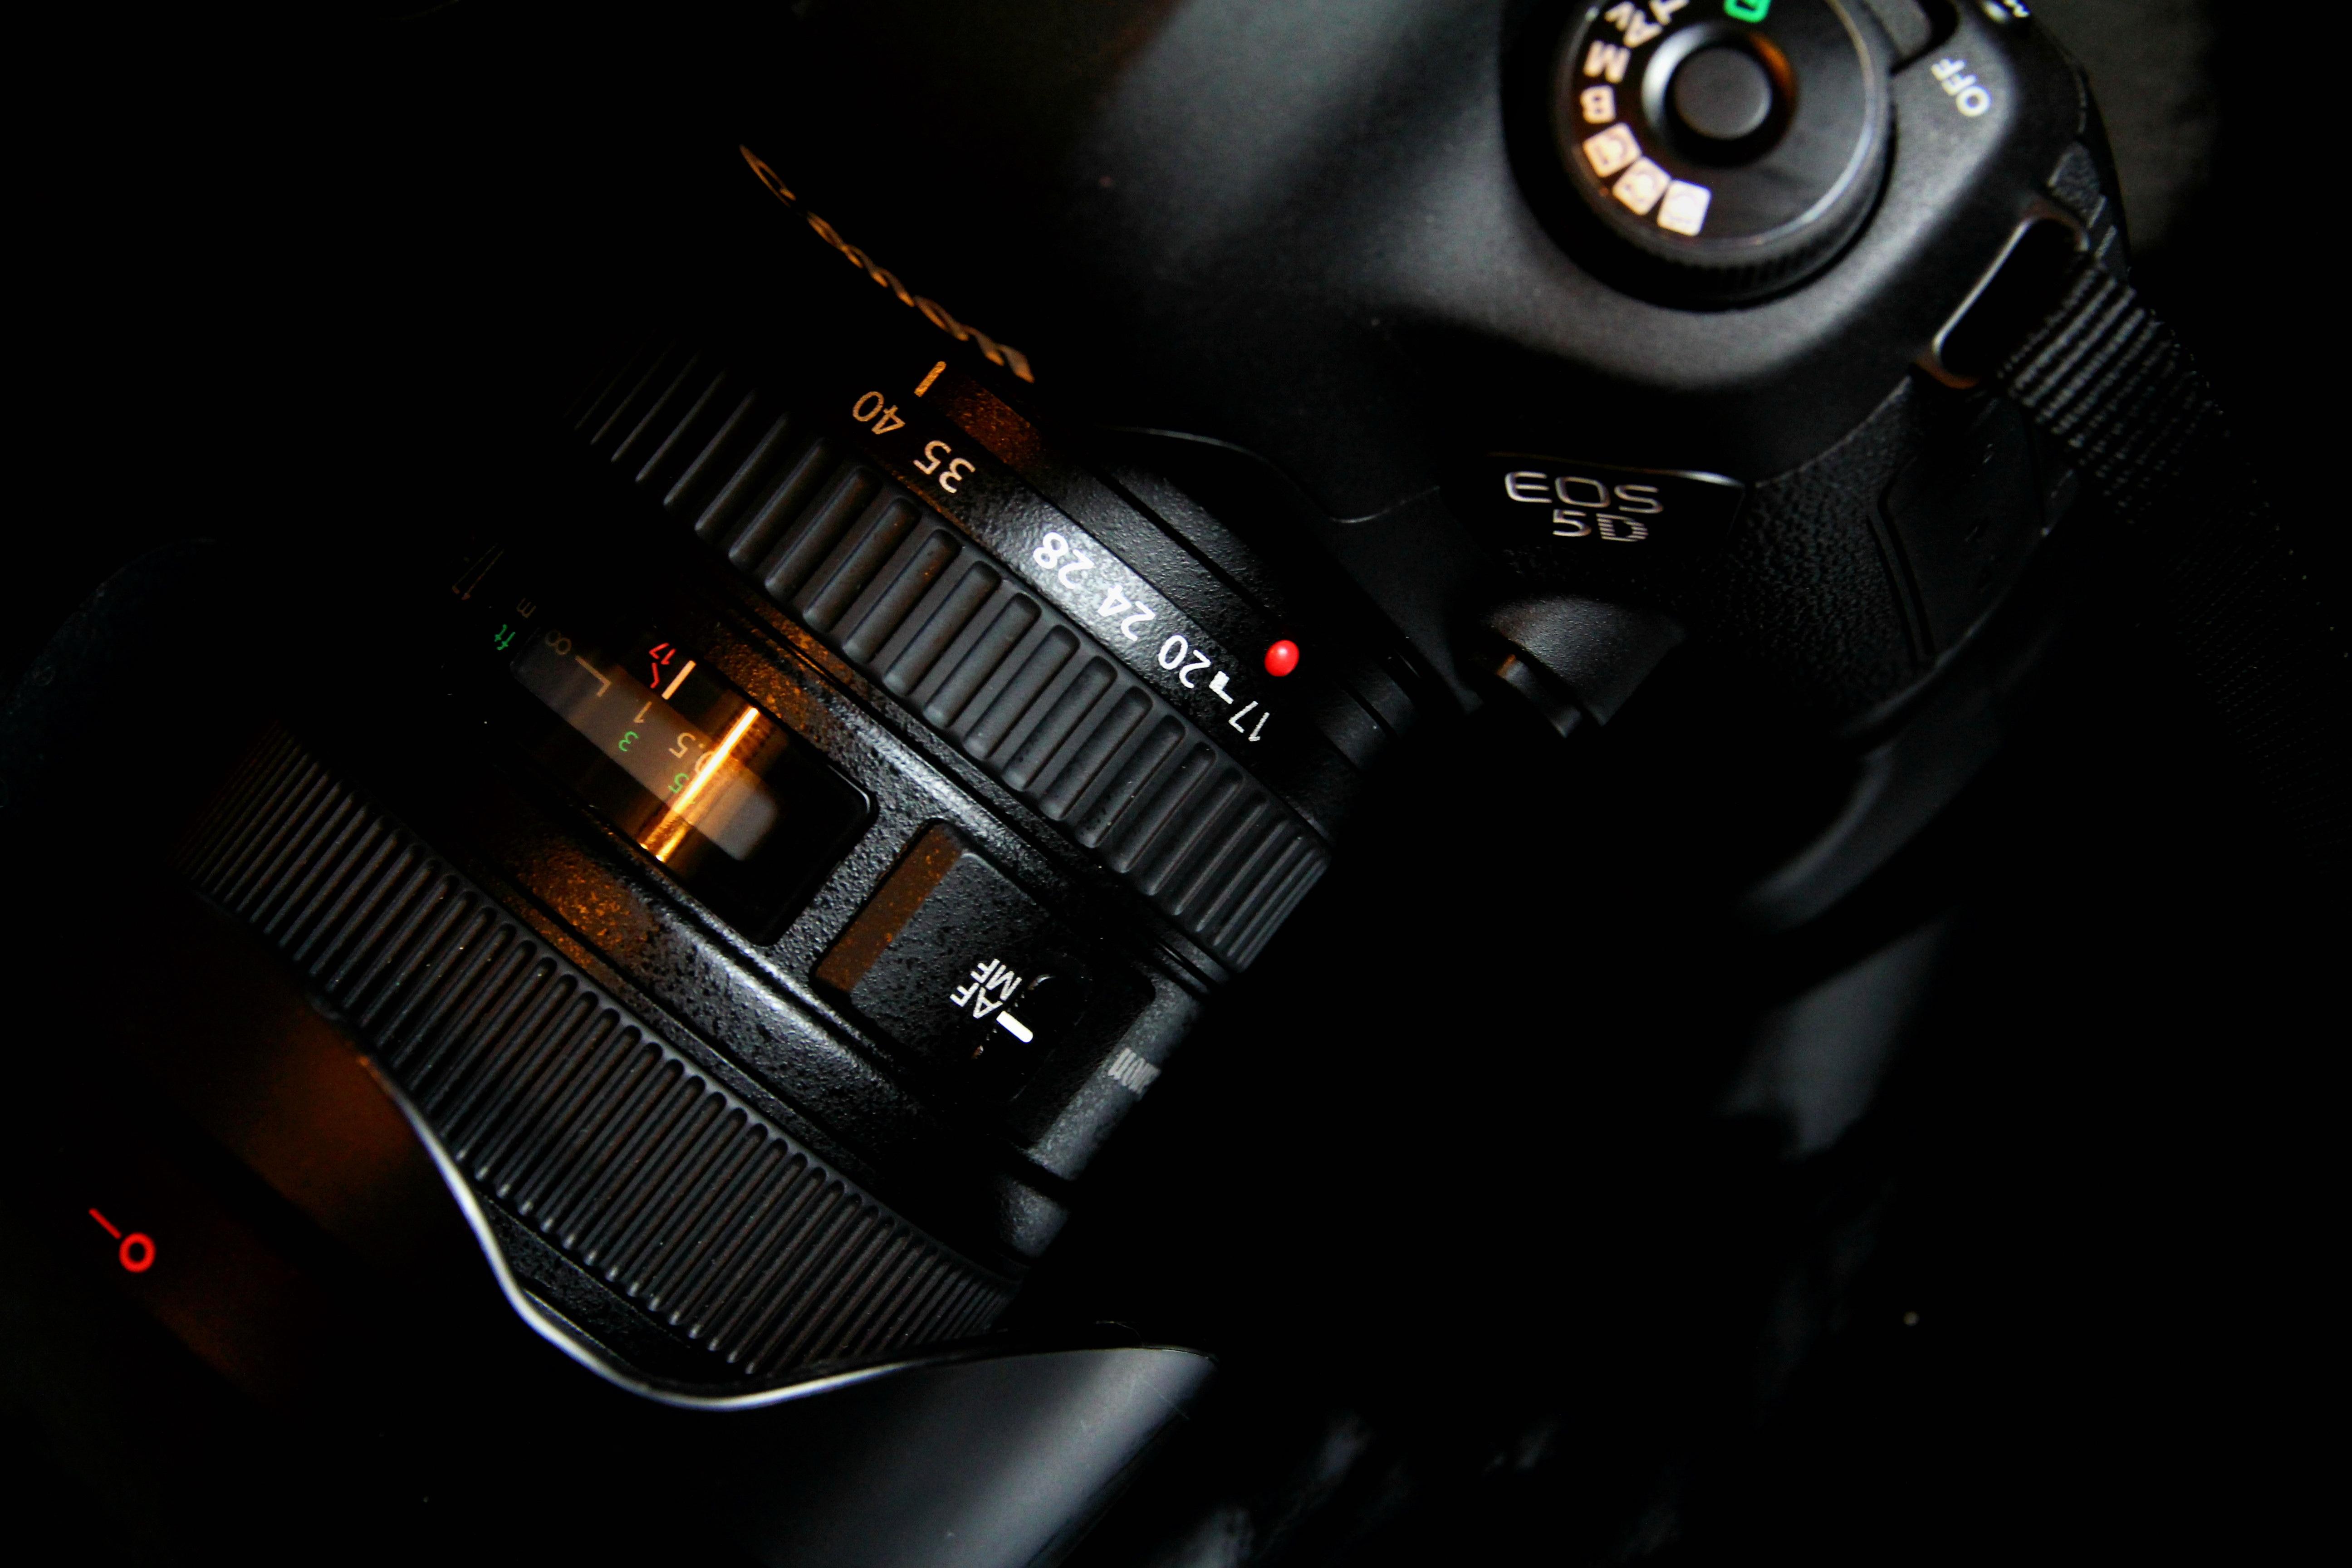 Light Car Camera Airport Vehicle Canon Darkness Black Reflex Digital Objective 5d3 Xie